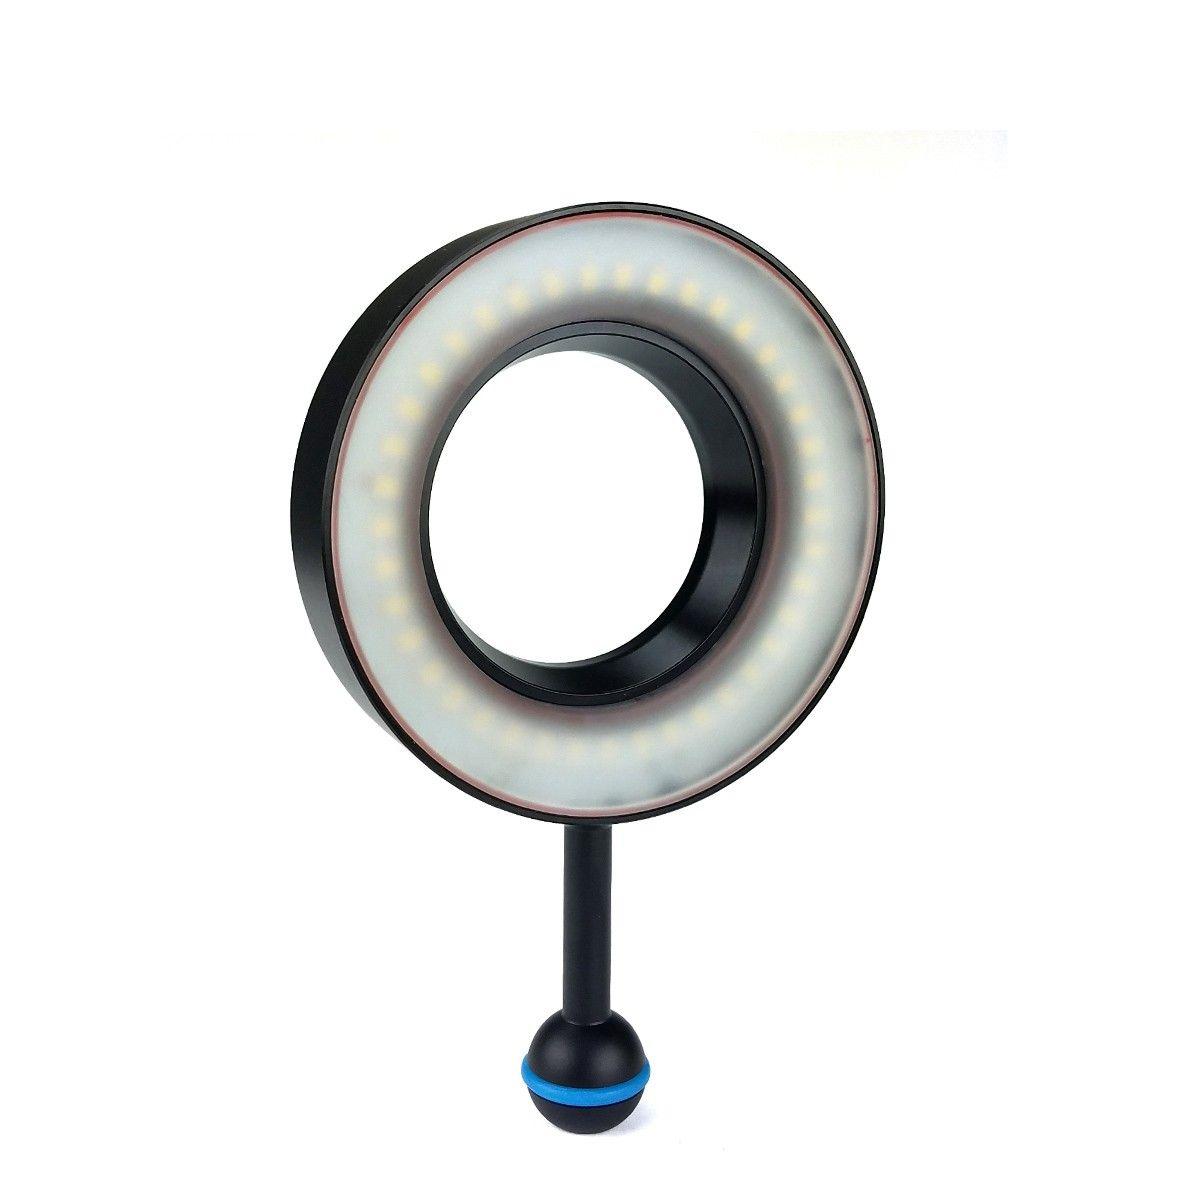 Meikon SL-108 Underwater Diving Macro Ring Flash Light Fill Lighting For Sony A7 II Canon Fujifilm X100F Waterproof Housing Case